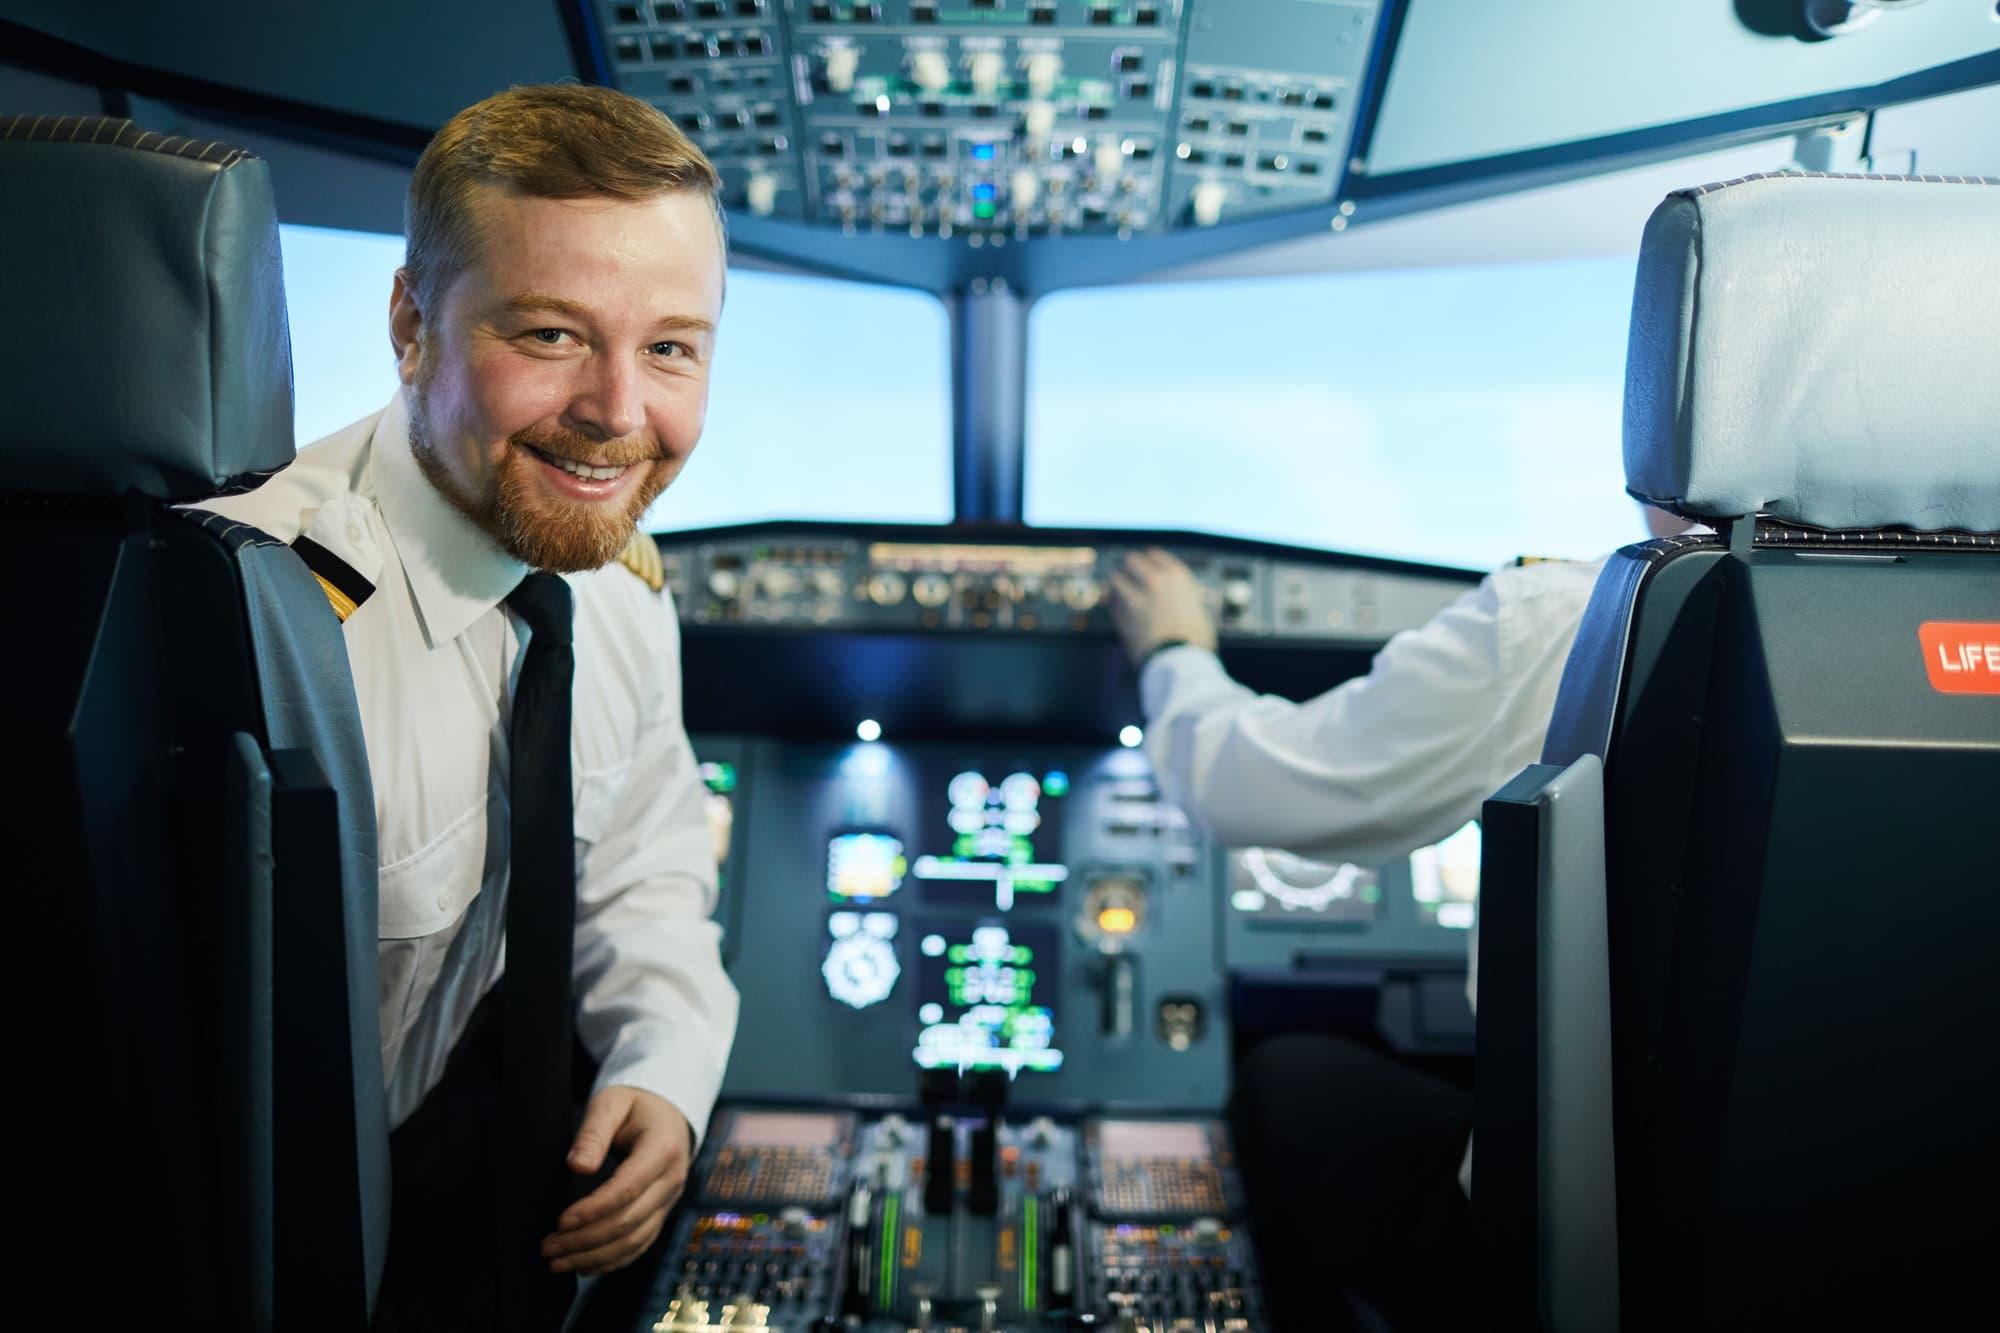 Confident bearded pilot in cockpit